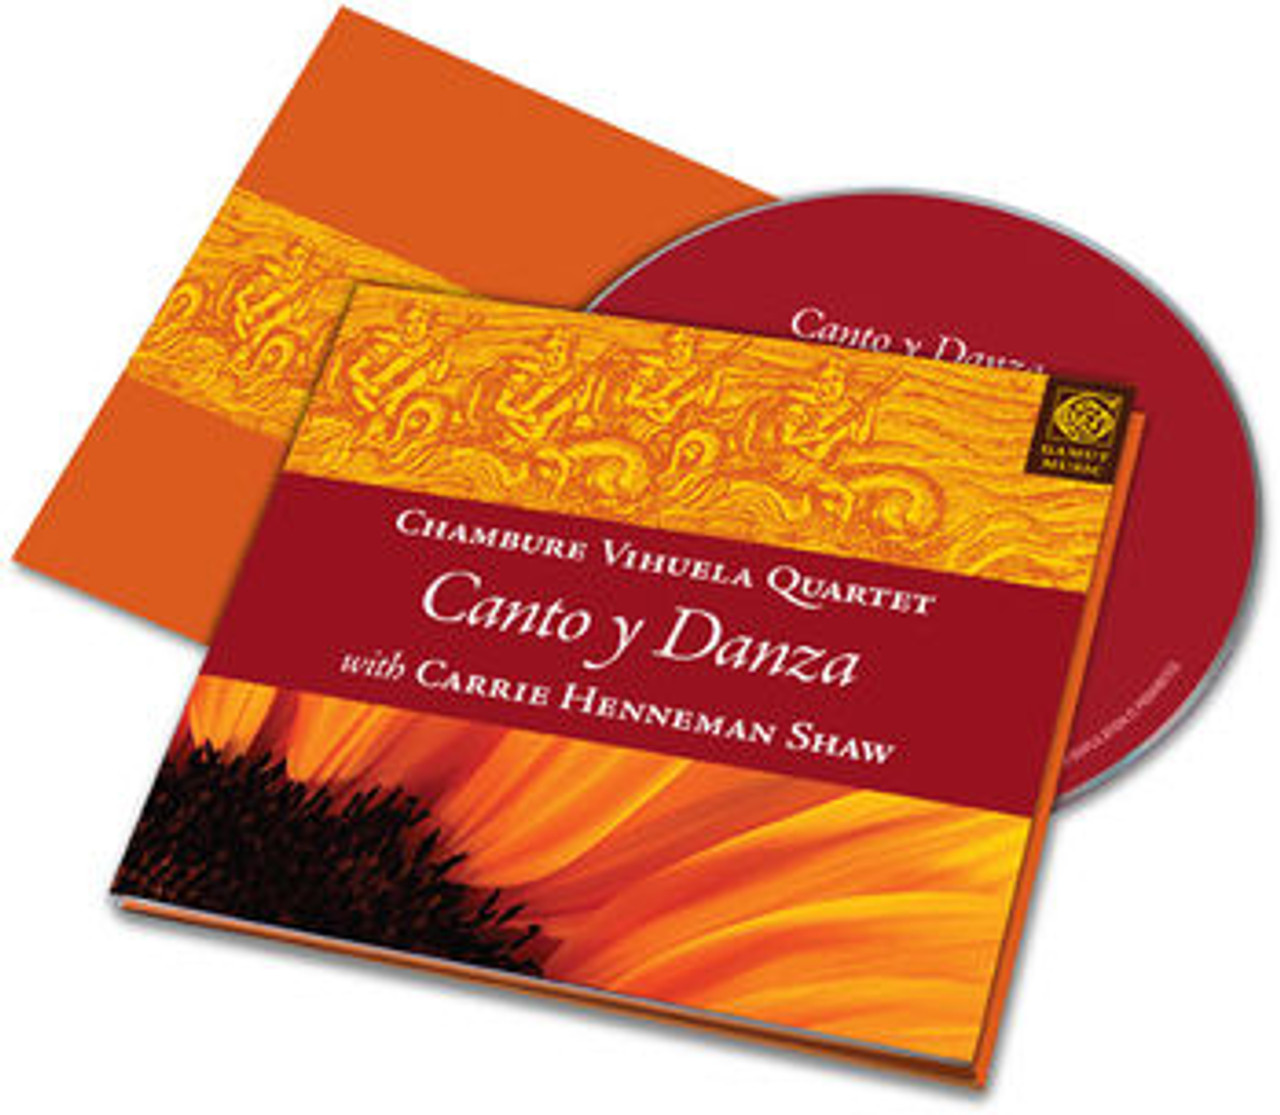 Canto y Danza: Songs and Dances of Renaissance Spain WAVE Digital Download